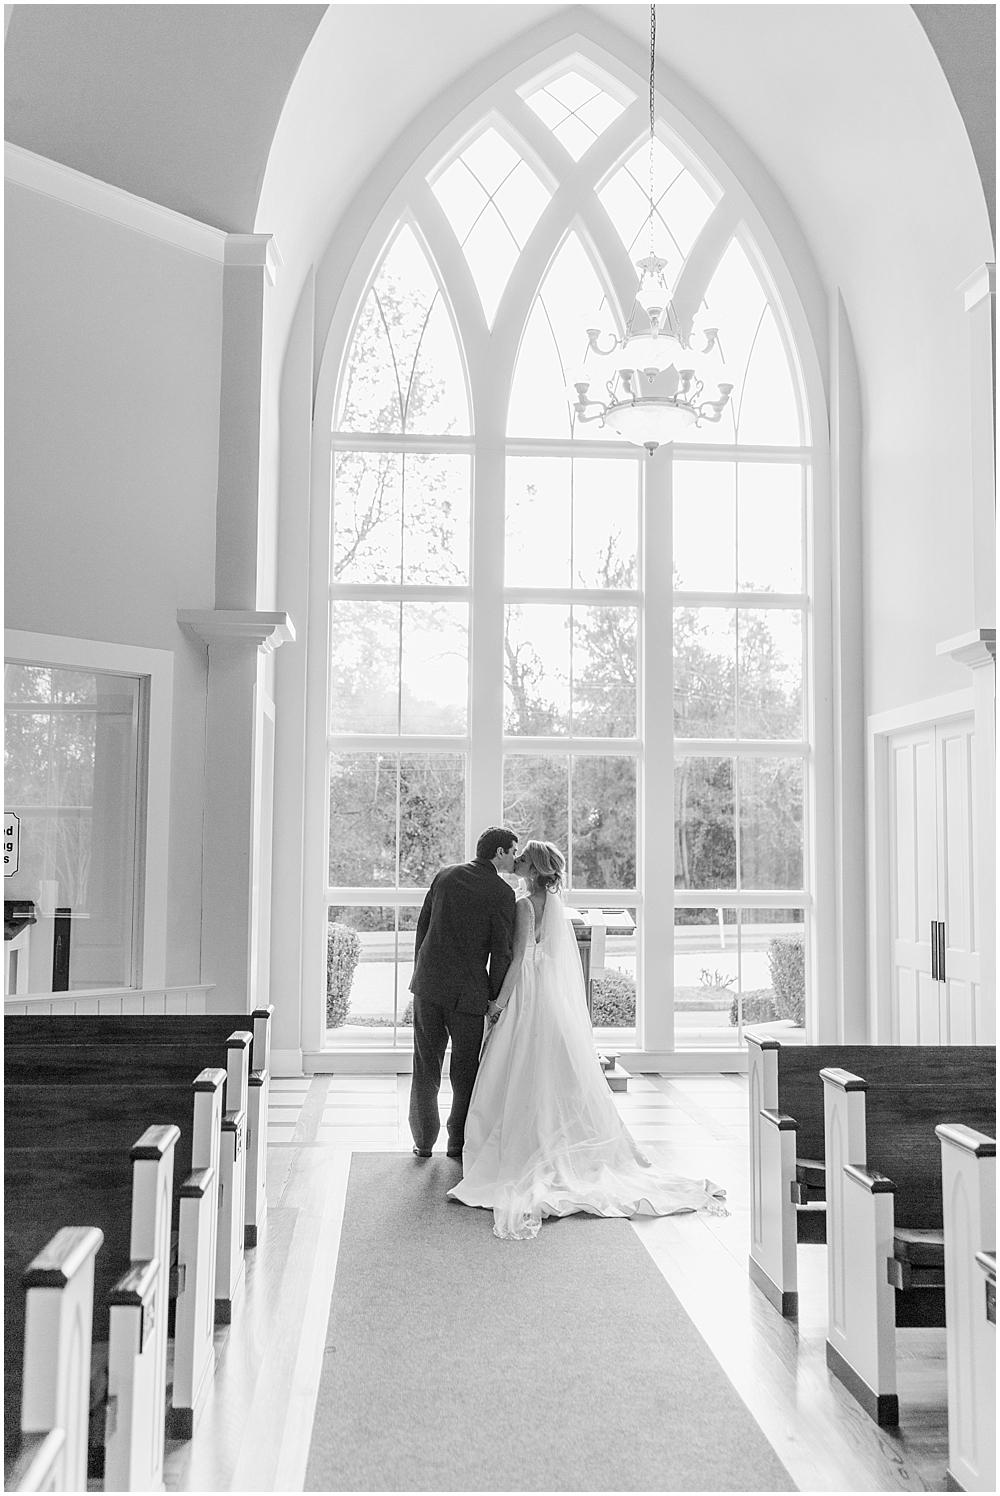 Ashton-Clark-Photography-Wedding-Portrait-Family-Photographer-Mobile-Alabama_0340.jpg